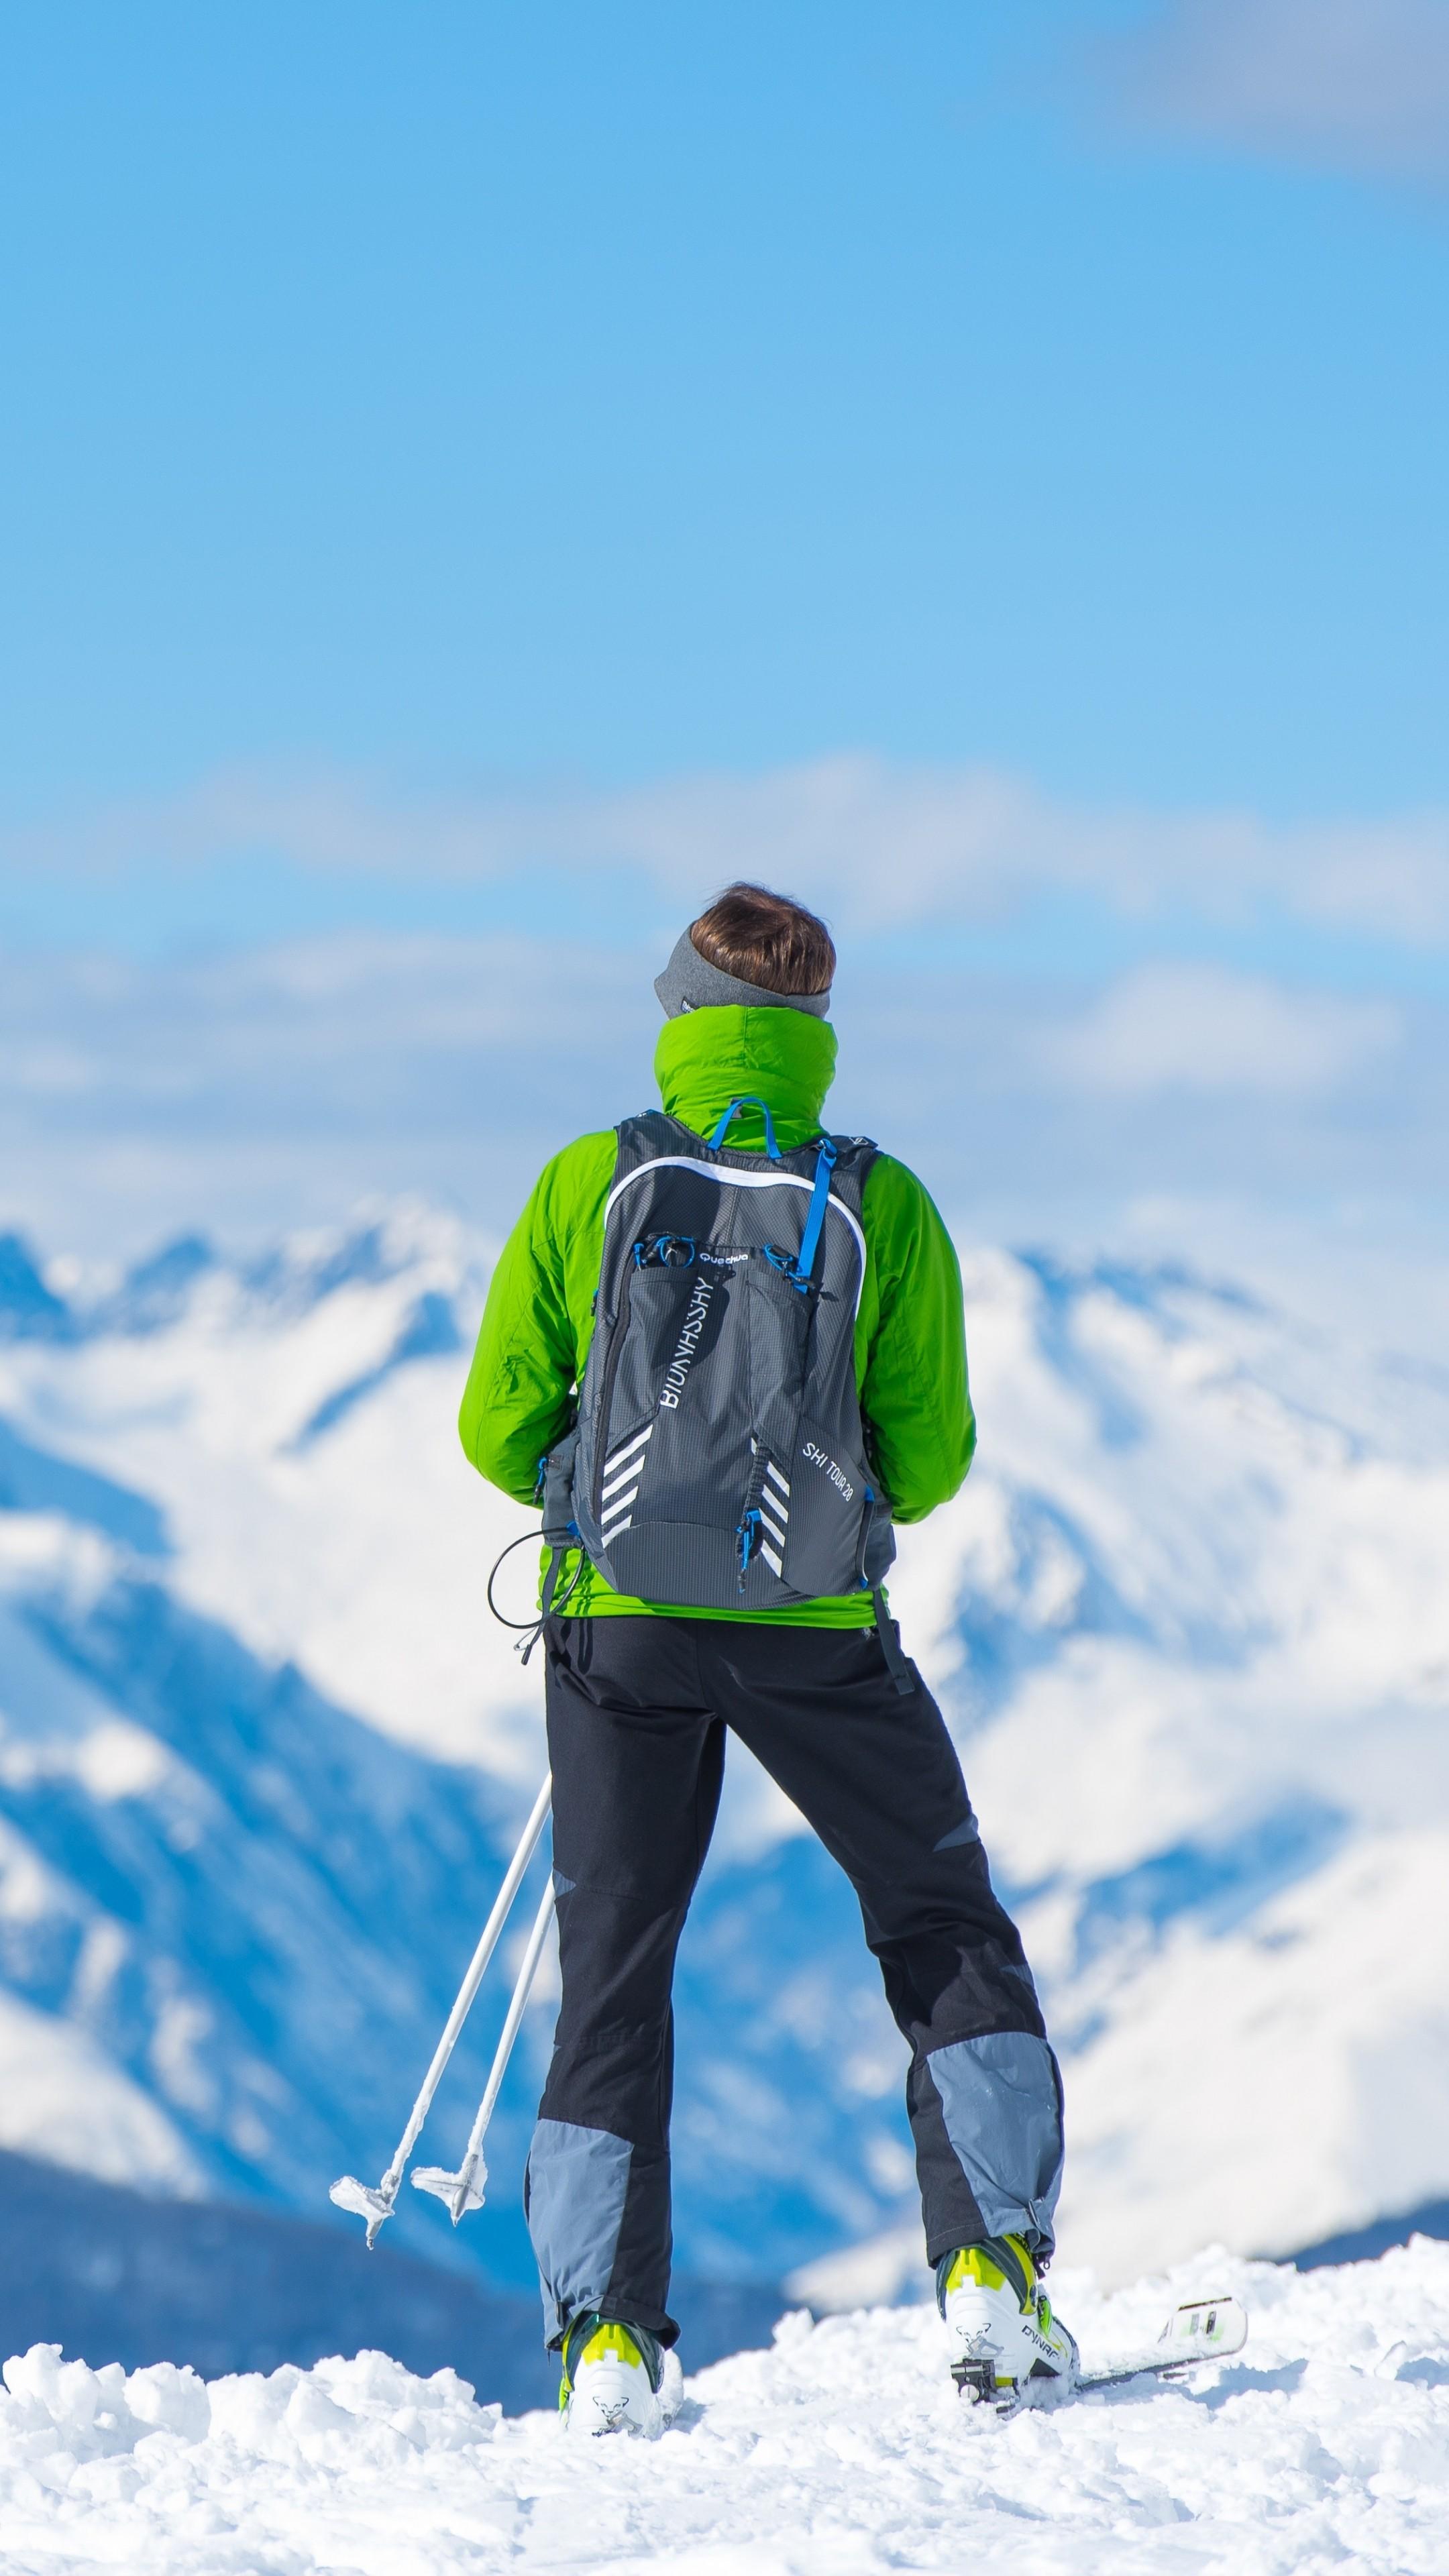 sportsman skiing mountain top tourist wallpaper - [2160x3840]